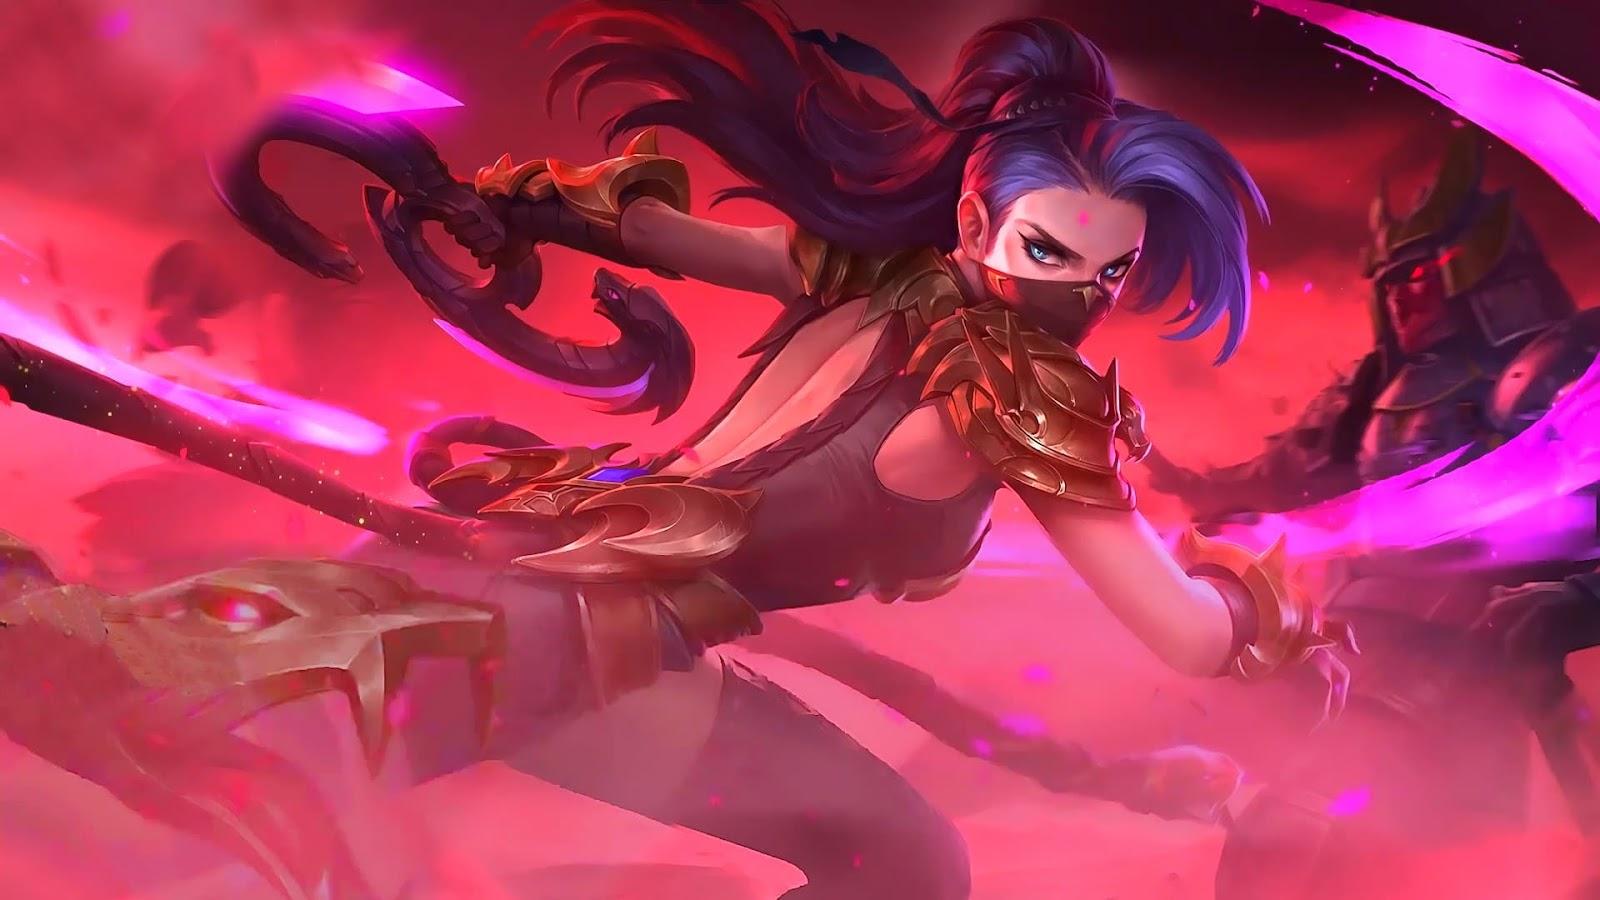 Wallpaper Hanabi Viper Skin Mobile Legends HD for PC